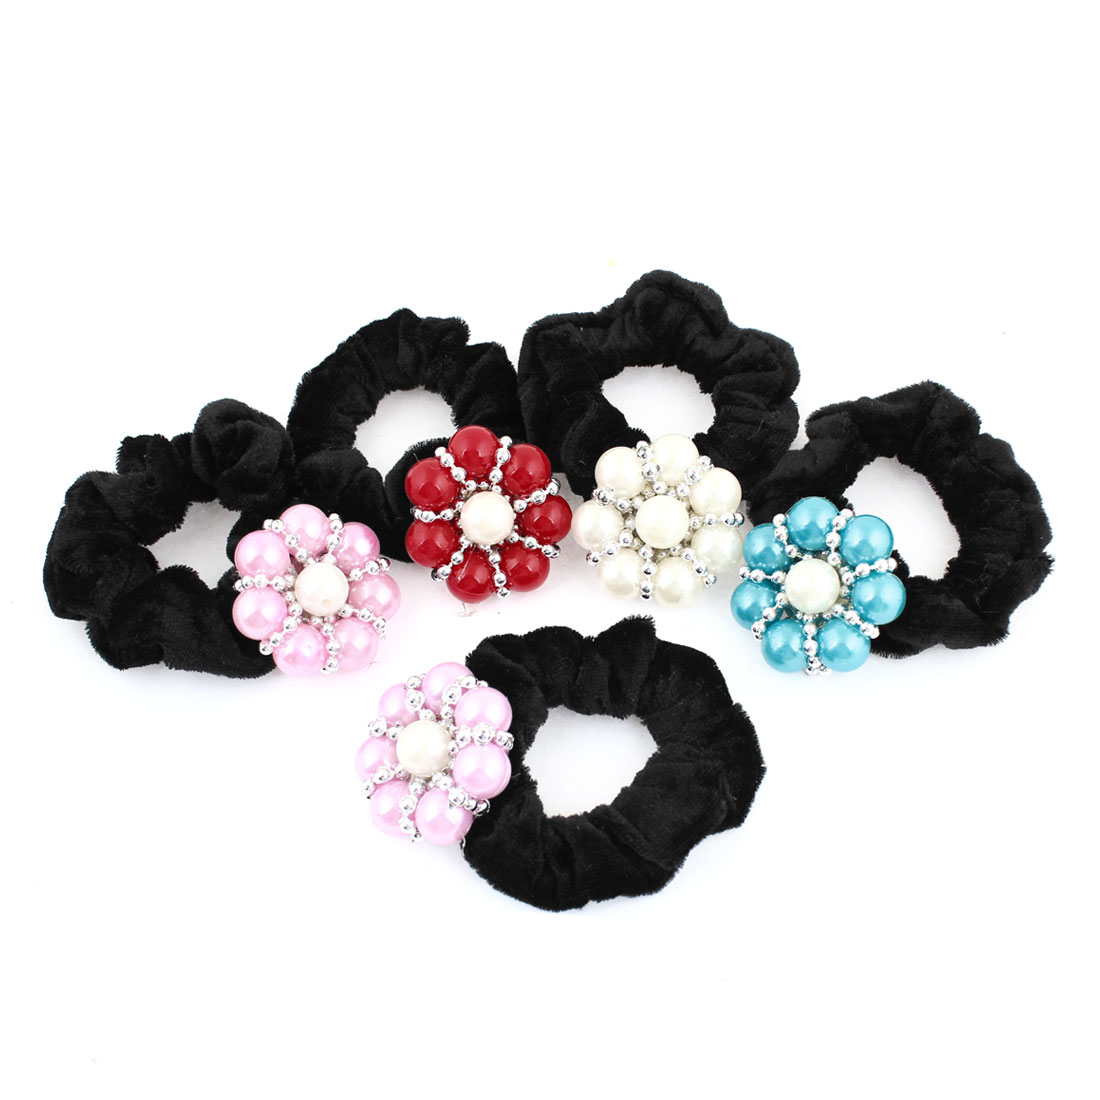 5 Pcs Wedding Flower Black Velvet Stretchy Hair Tie Ponytail Holder